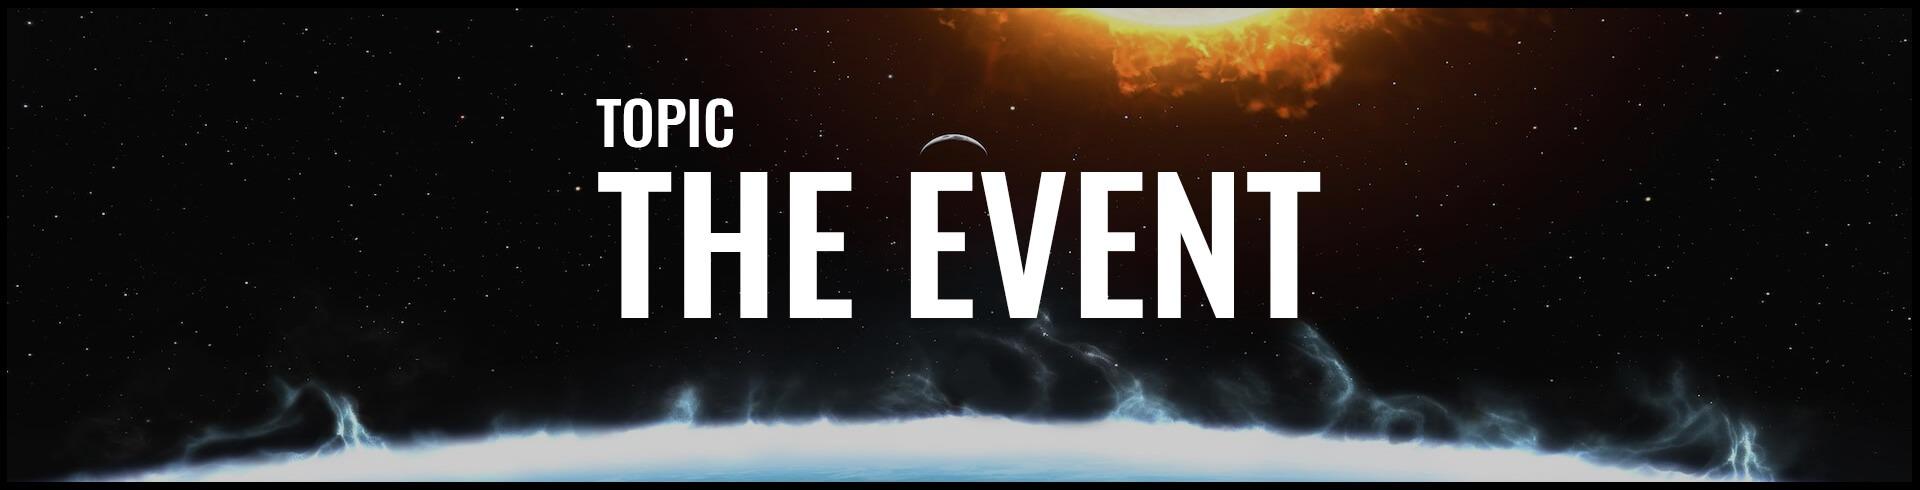 The-Event-Great-Awakening-Report